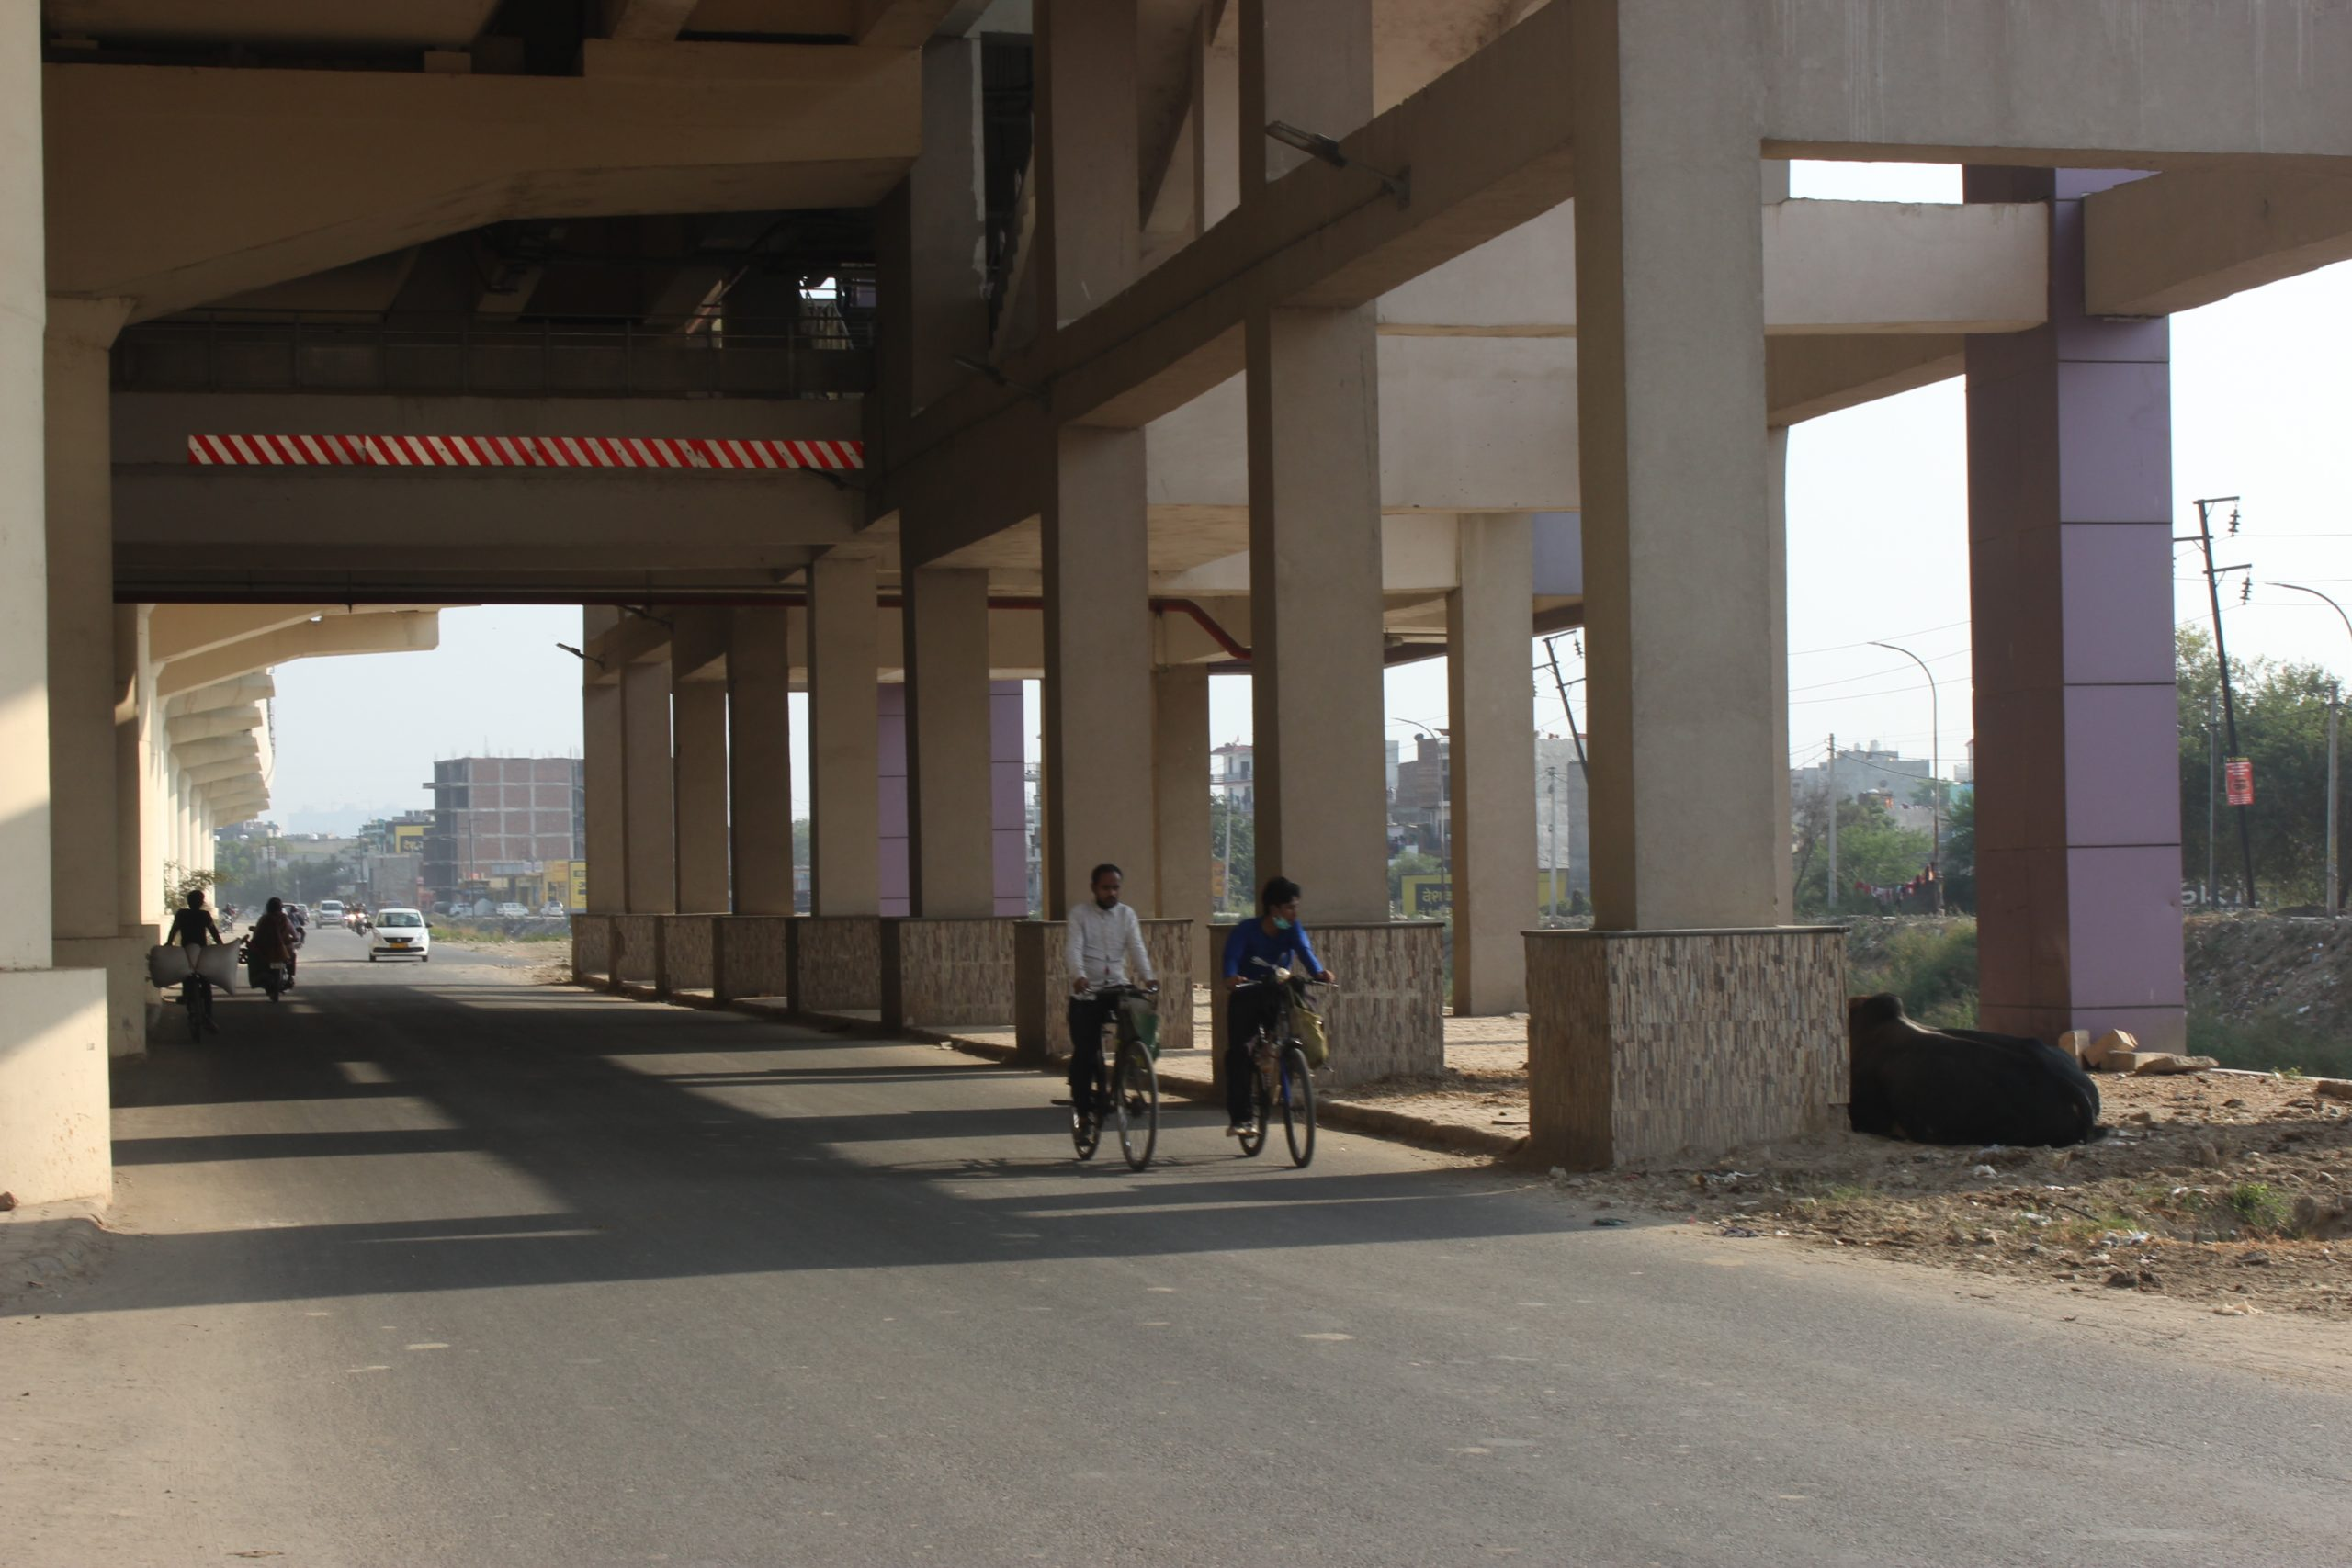 A road through a metro station